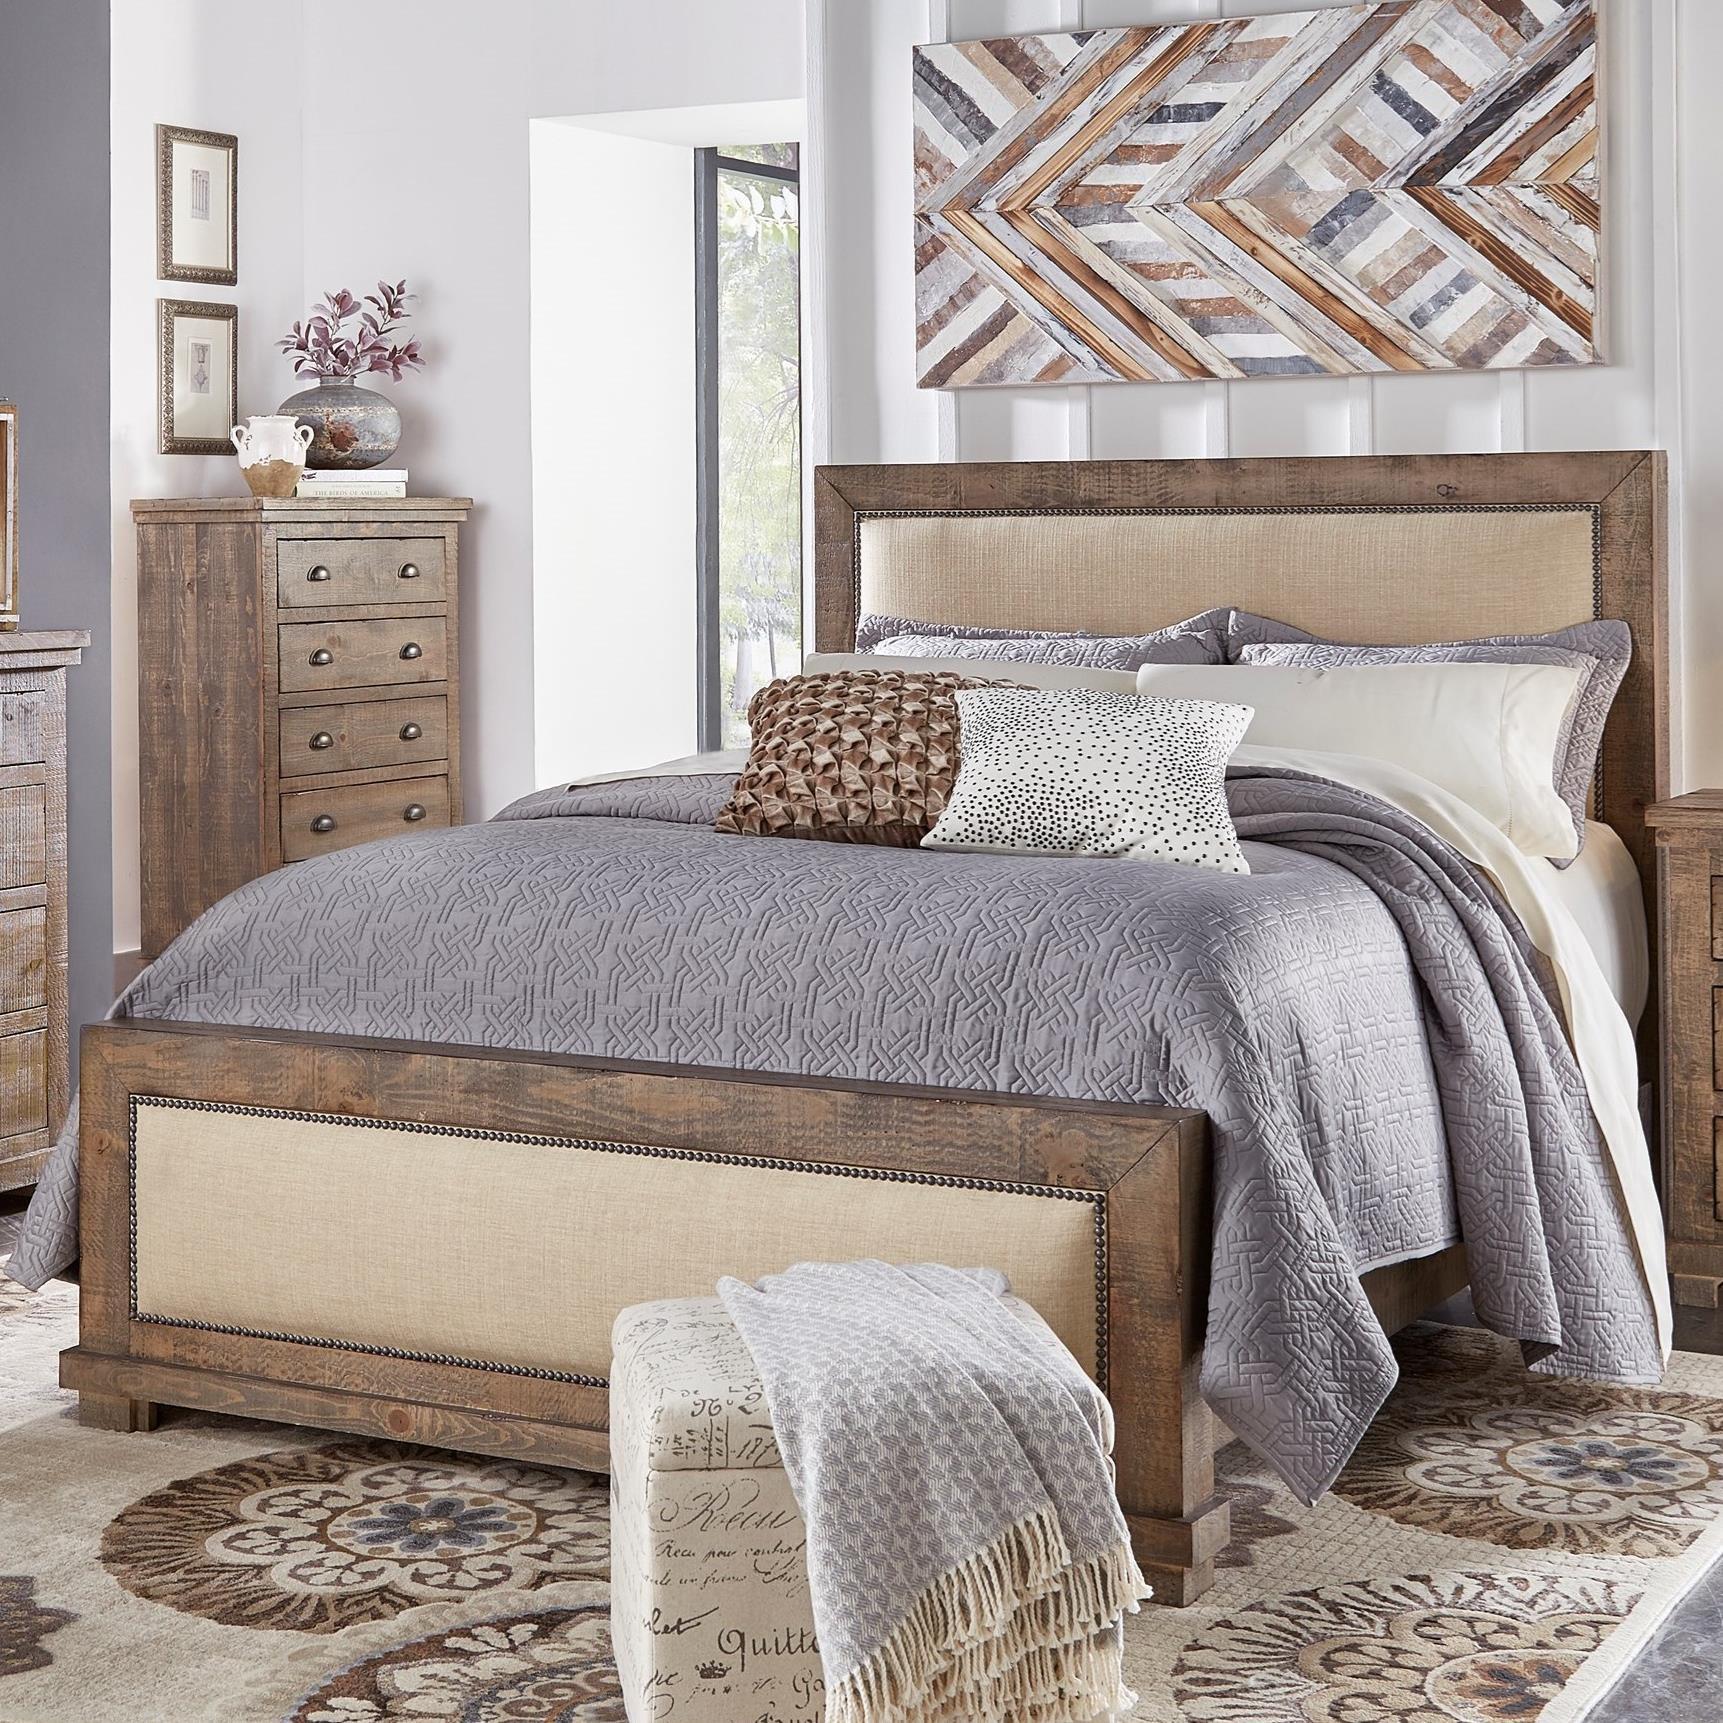 Progressive Furniture Willow King Upholstered Bed   Item Number: P635 94+95+